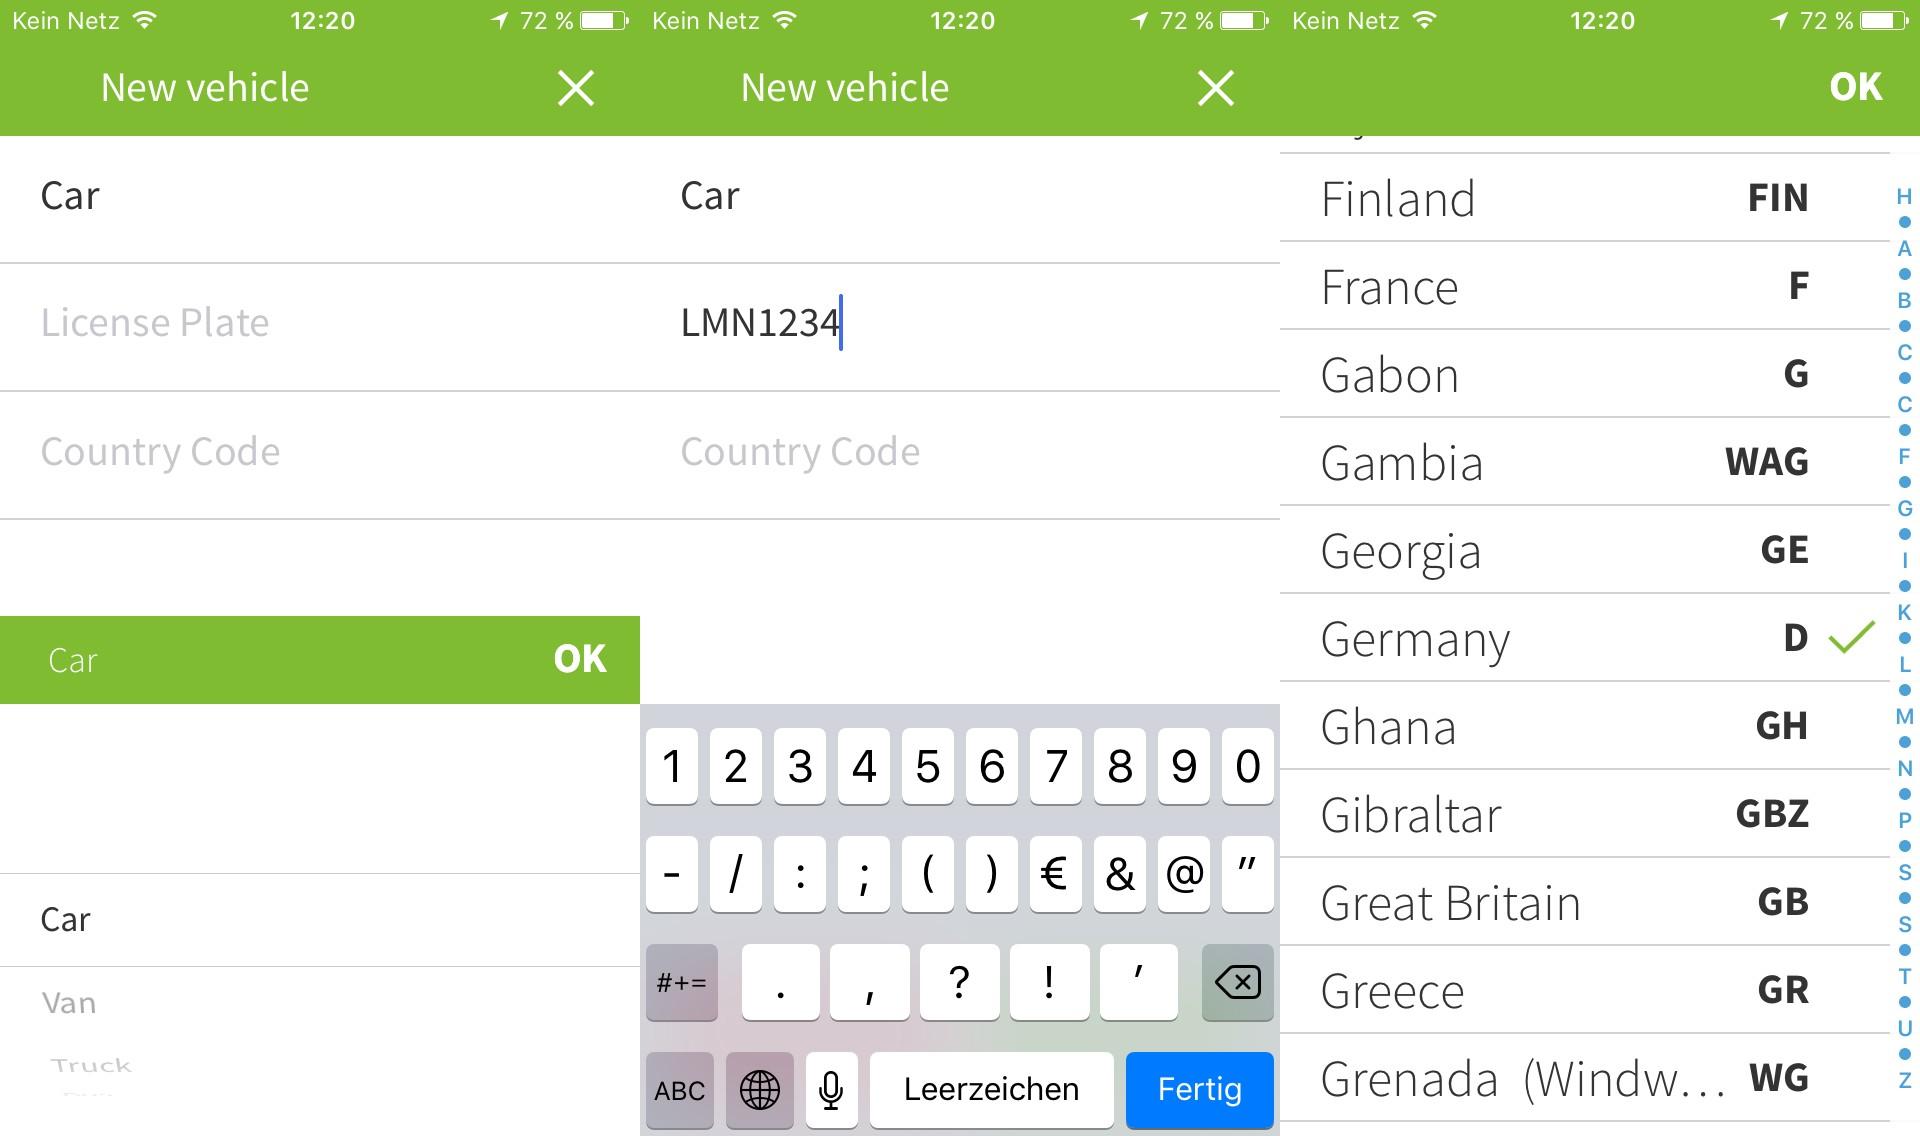 Fahrzeugdaten für die Maut per App